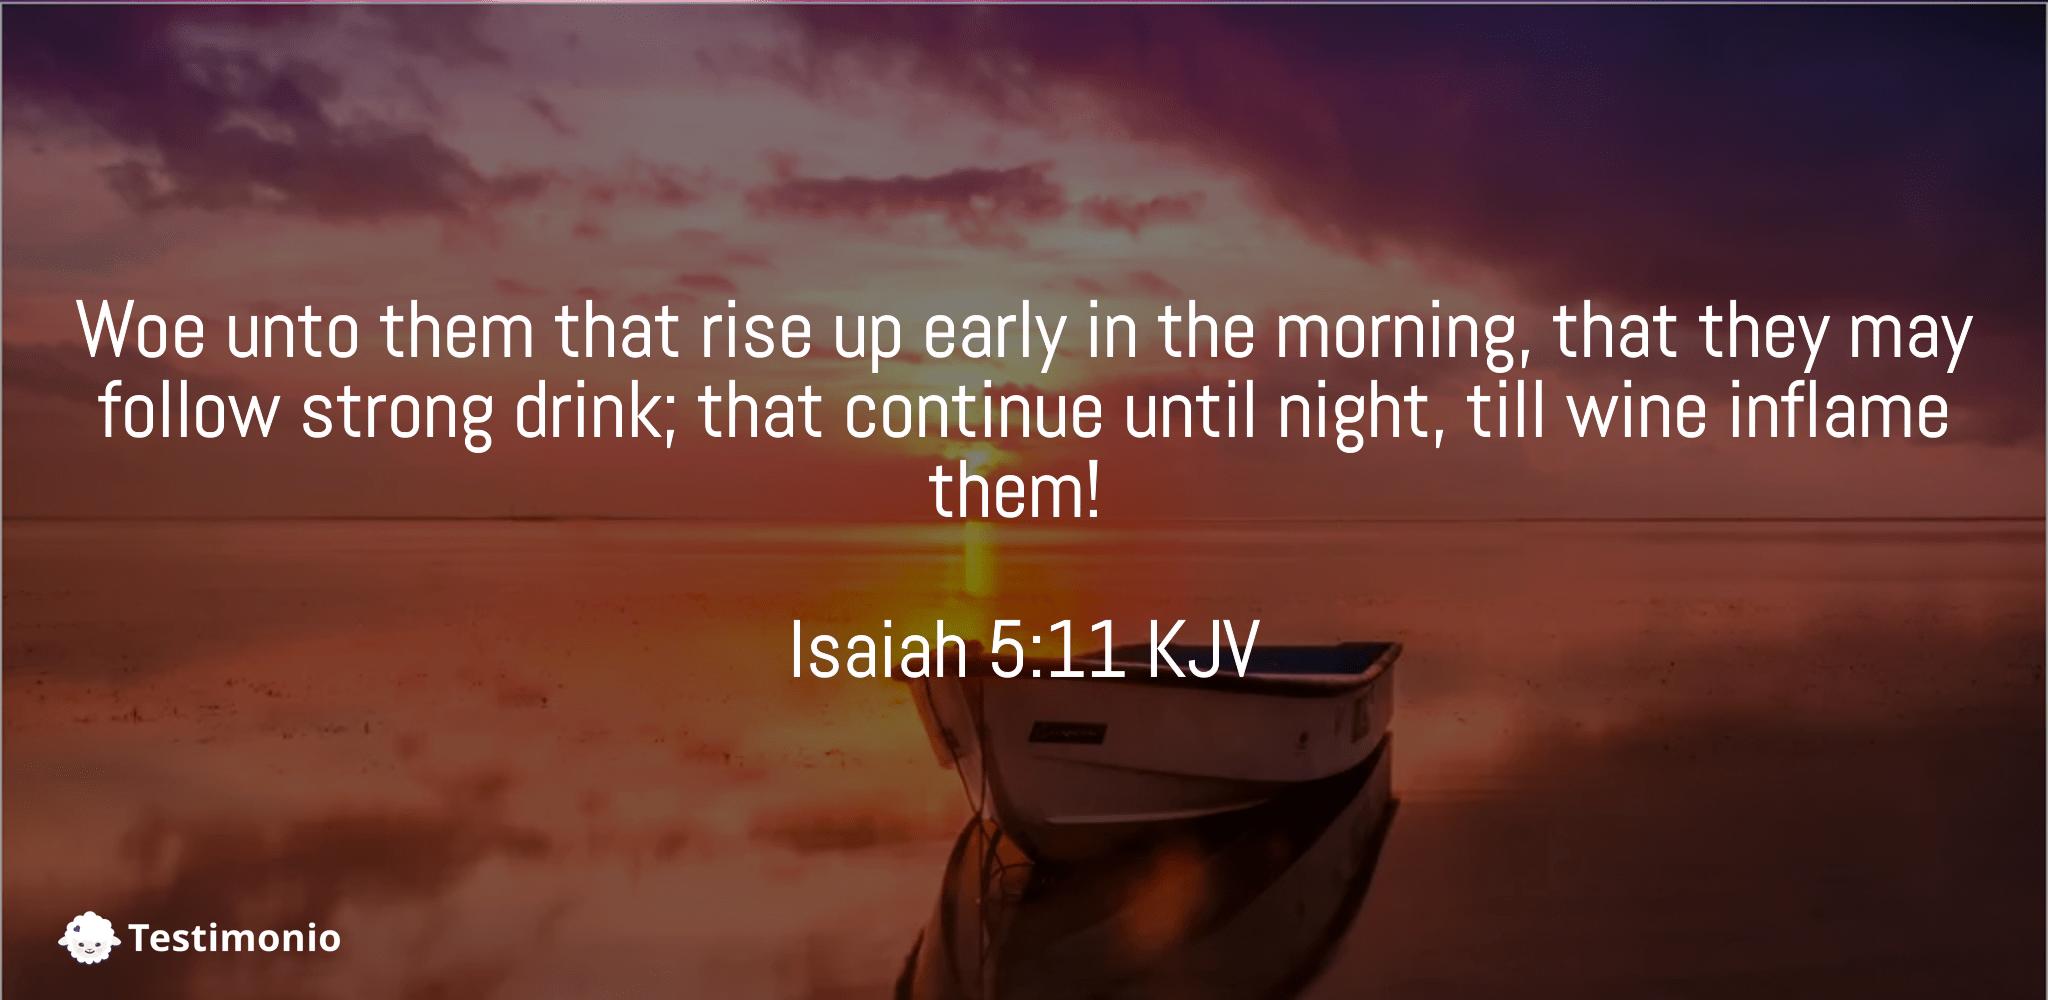 Isaiah 5:11